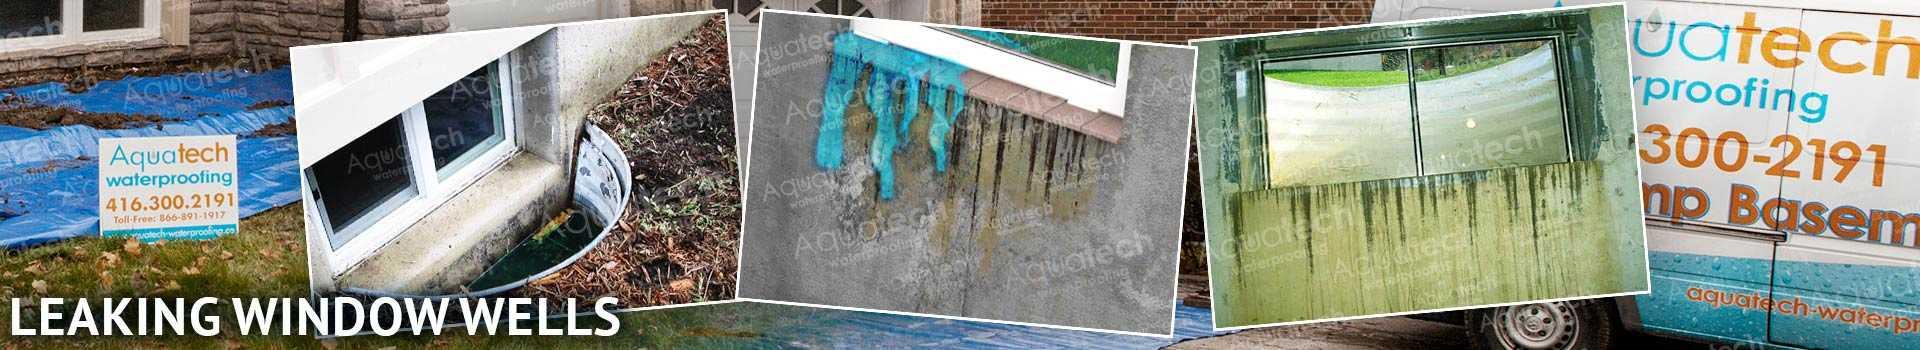 leaking-window-wells